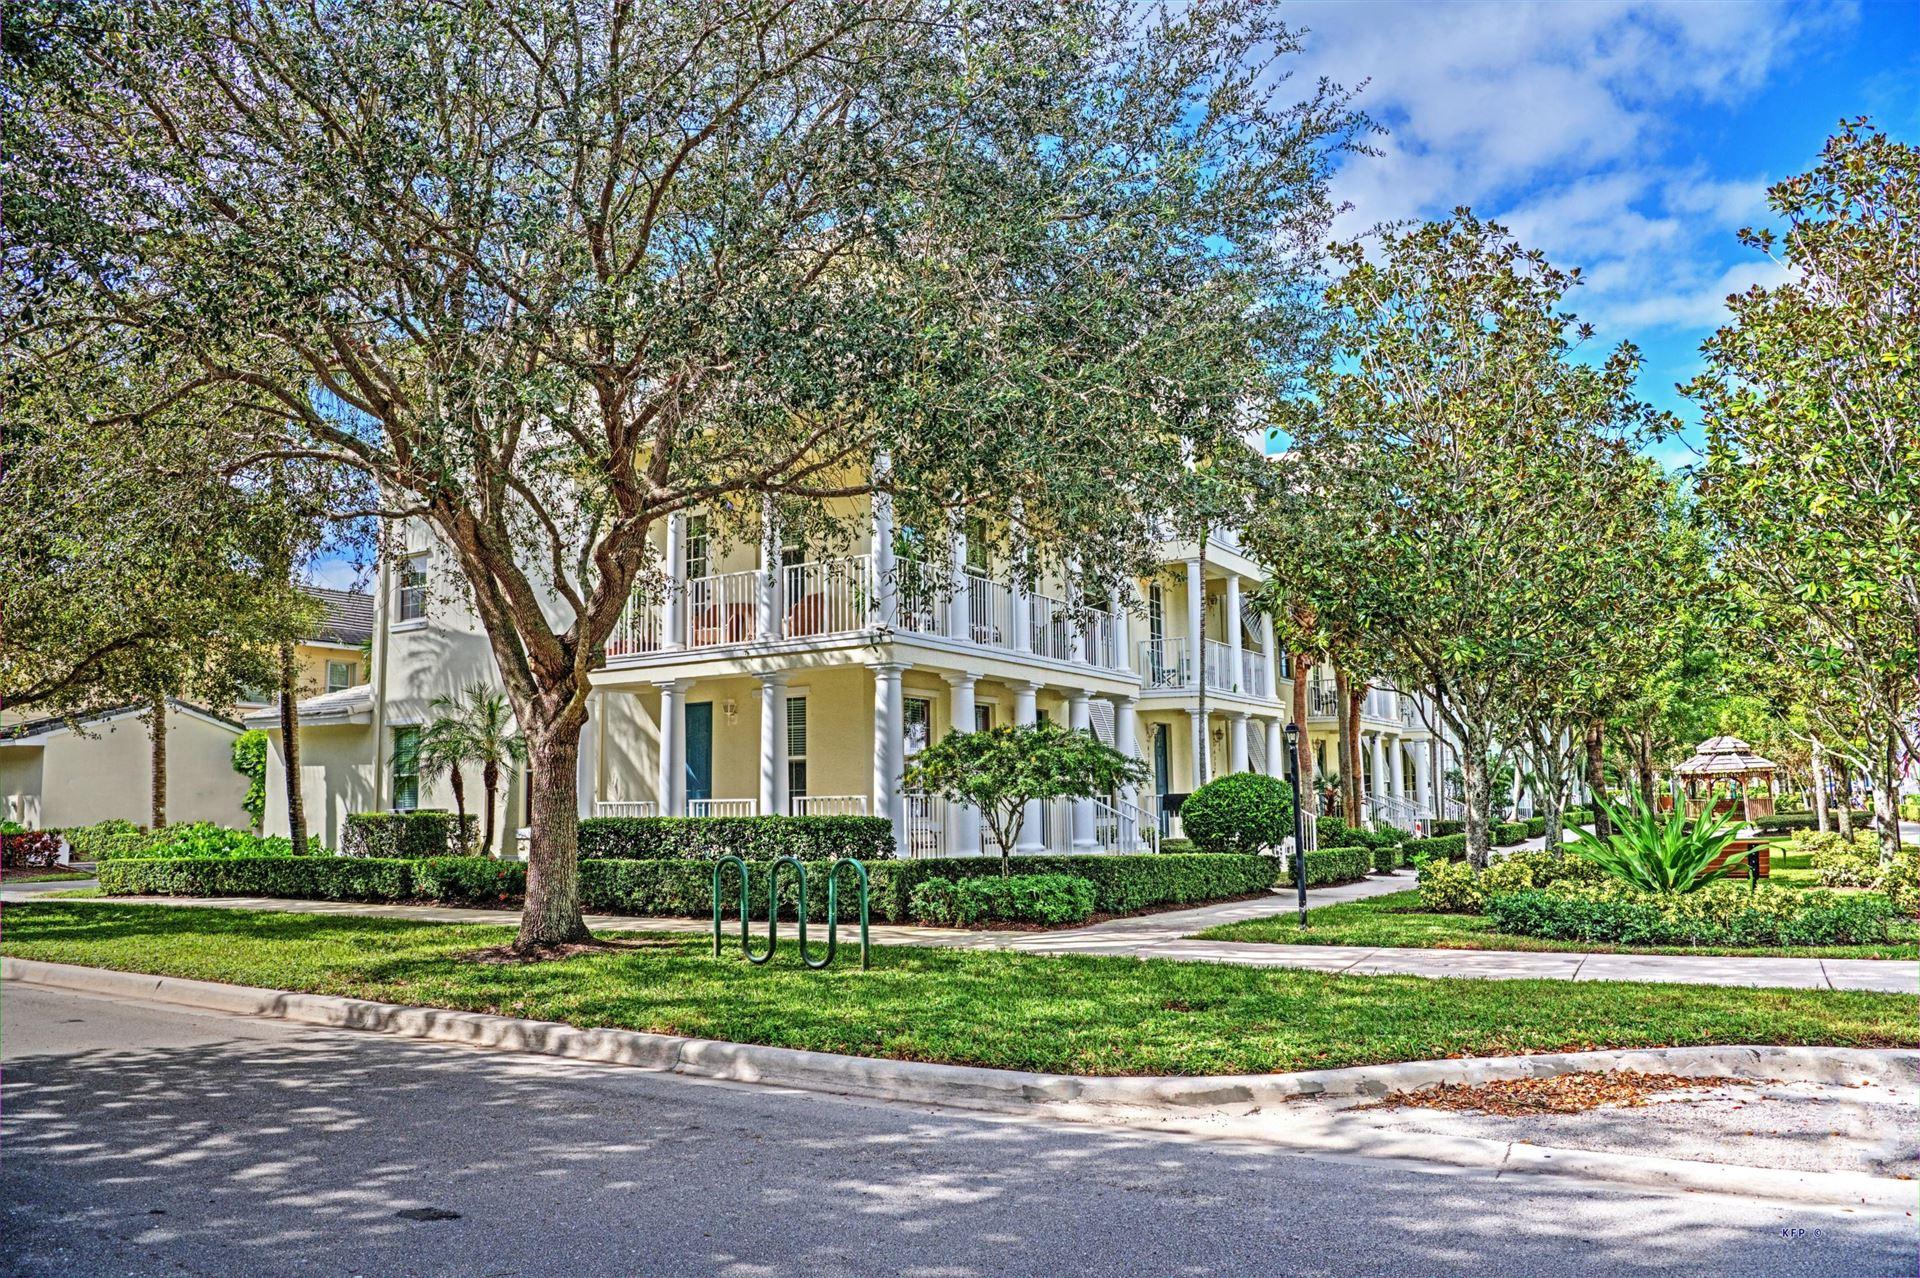 Photo of 4345 Savannah Bay Place, Jupiter, FL 33458 (MLS # RX-10669196)